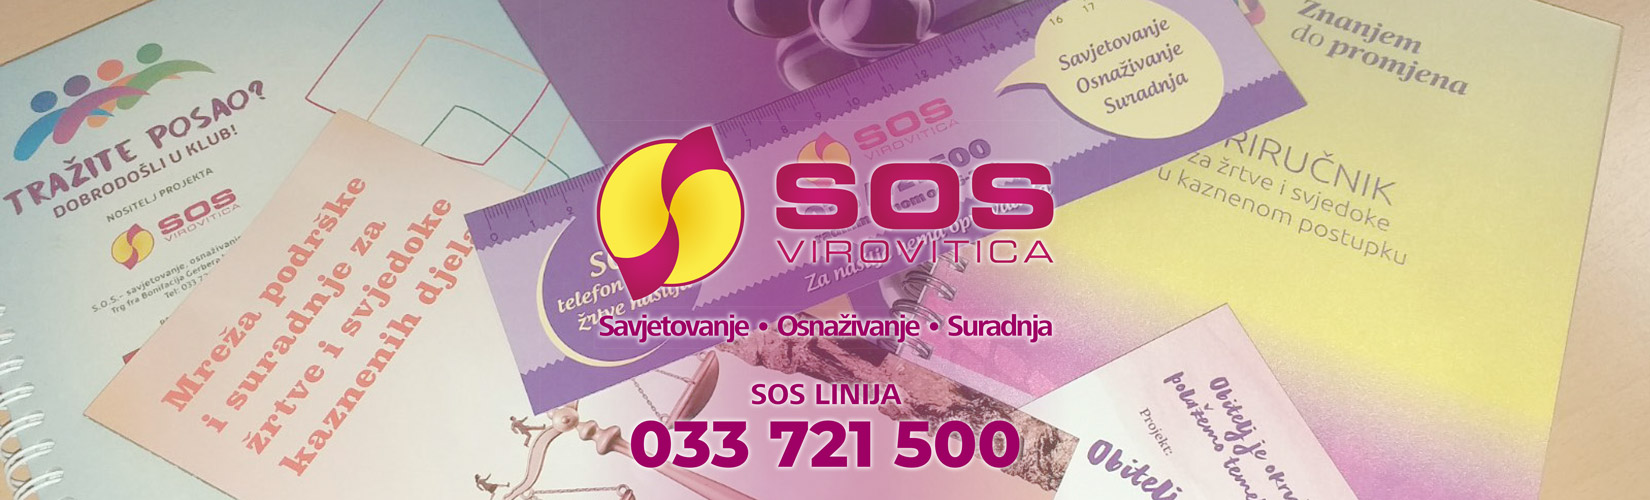 SOS VIROVITICA